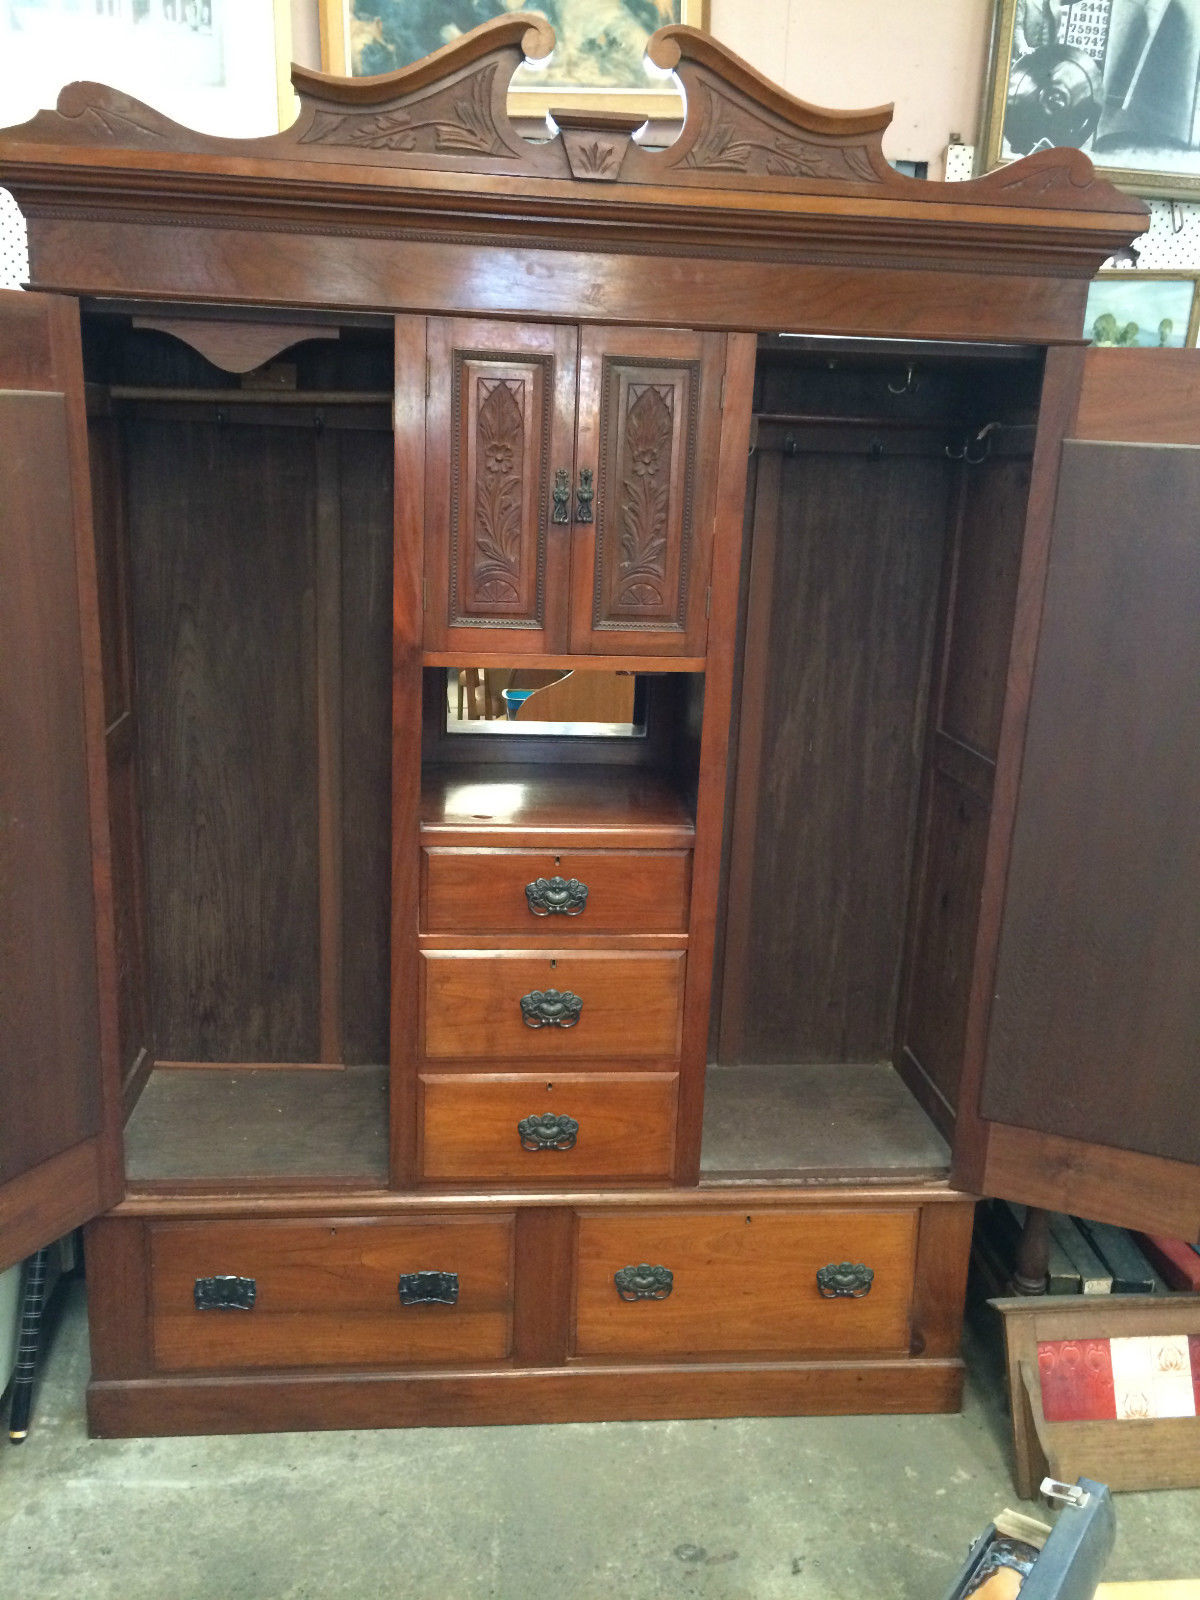 Antique Edwardian Carved Blackwood 4 Doors, 5 Drawers, Bevelled Mirror Wardrobe | Melbourne | Halsey Road Recyclers